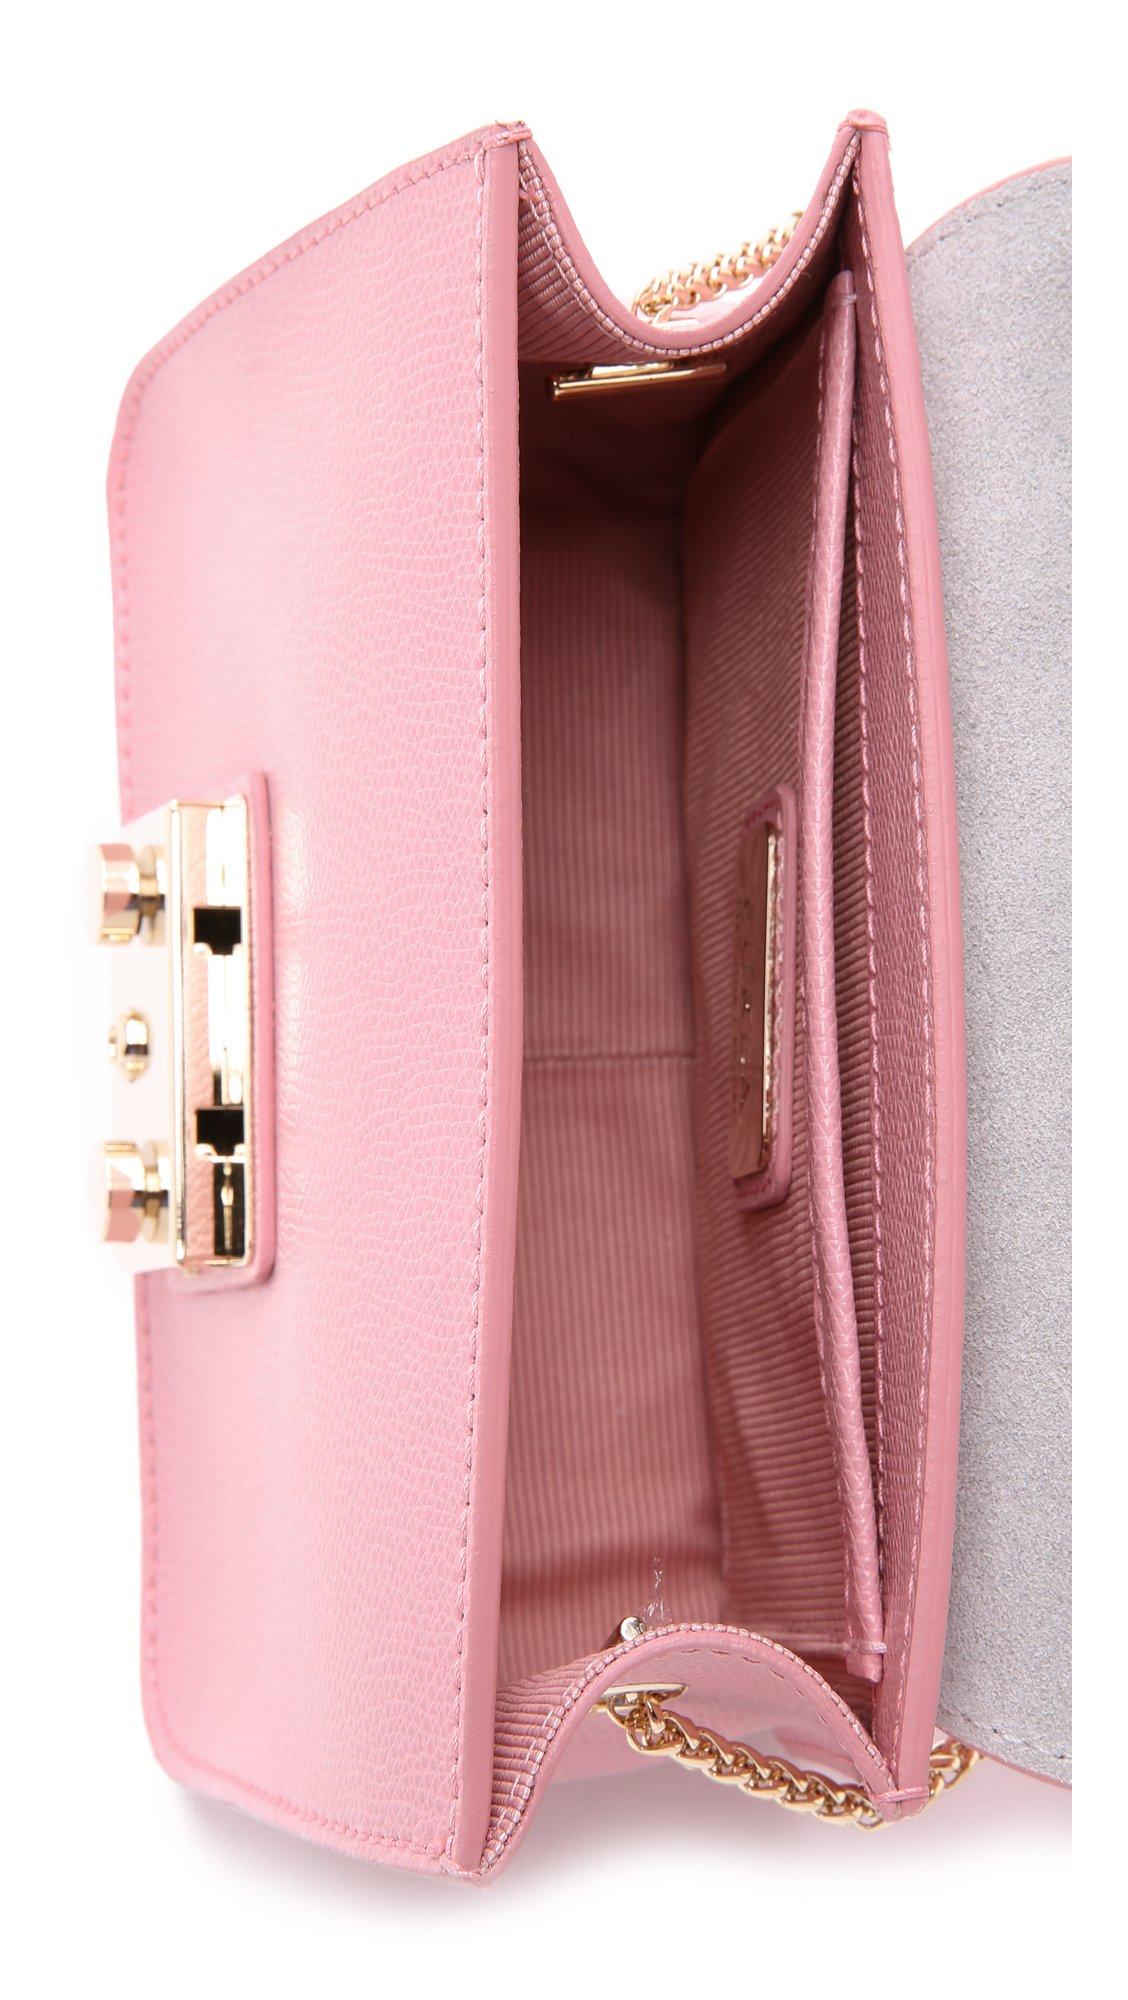 High Quality Furla Metropolis mini pouch Newest For Sale Discount Professional 1YgOxX3